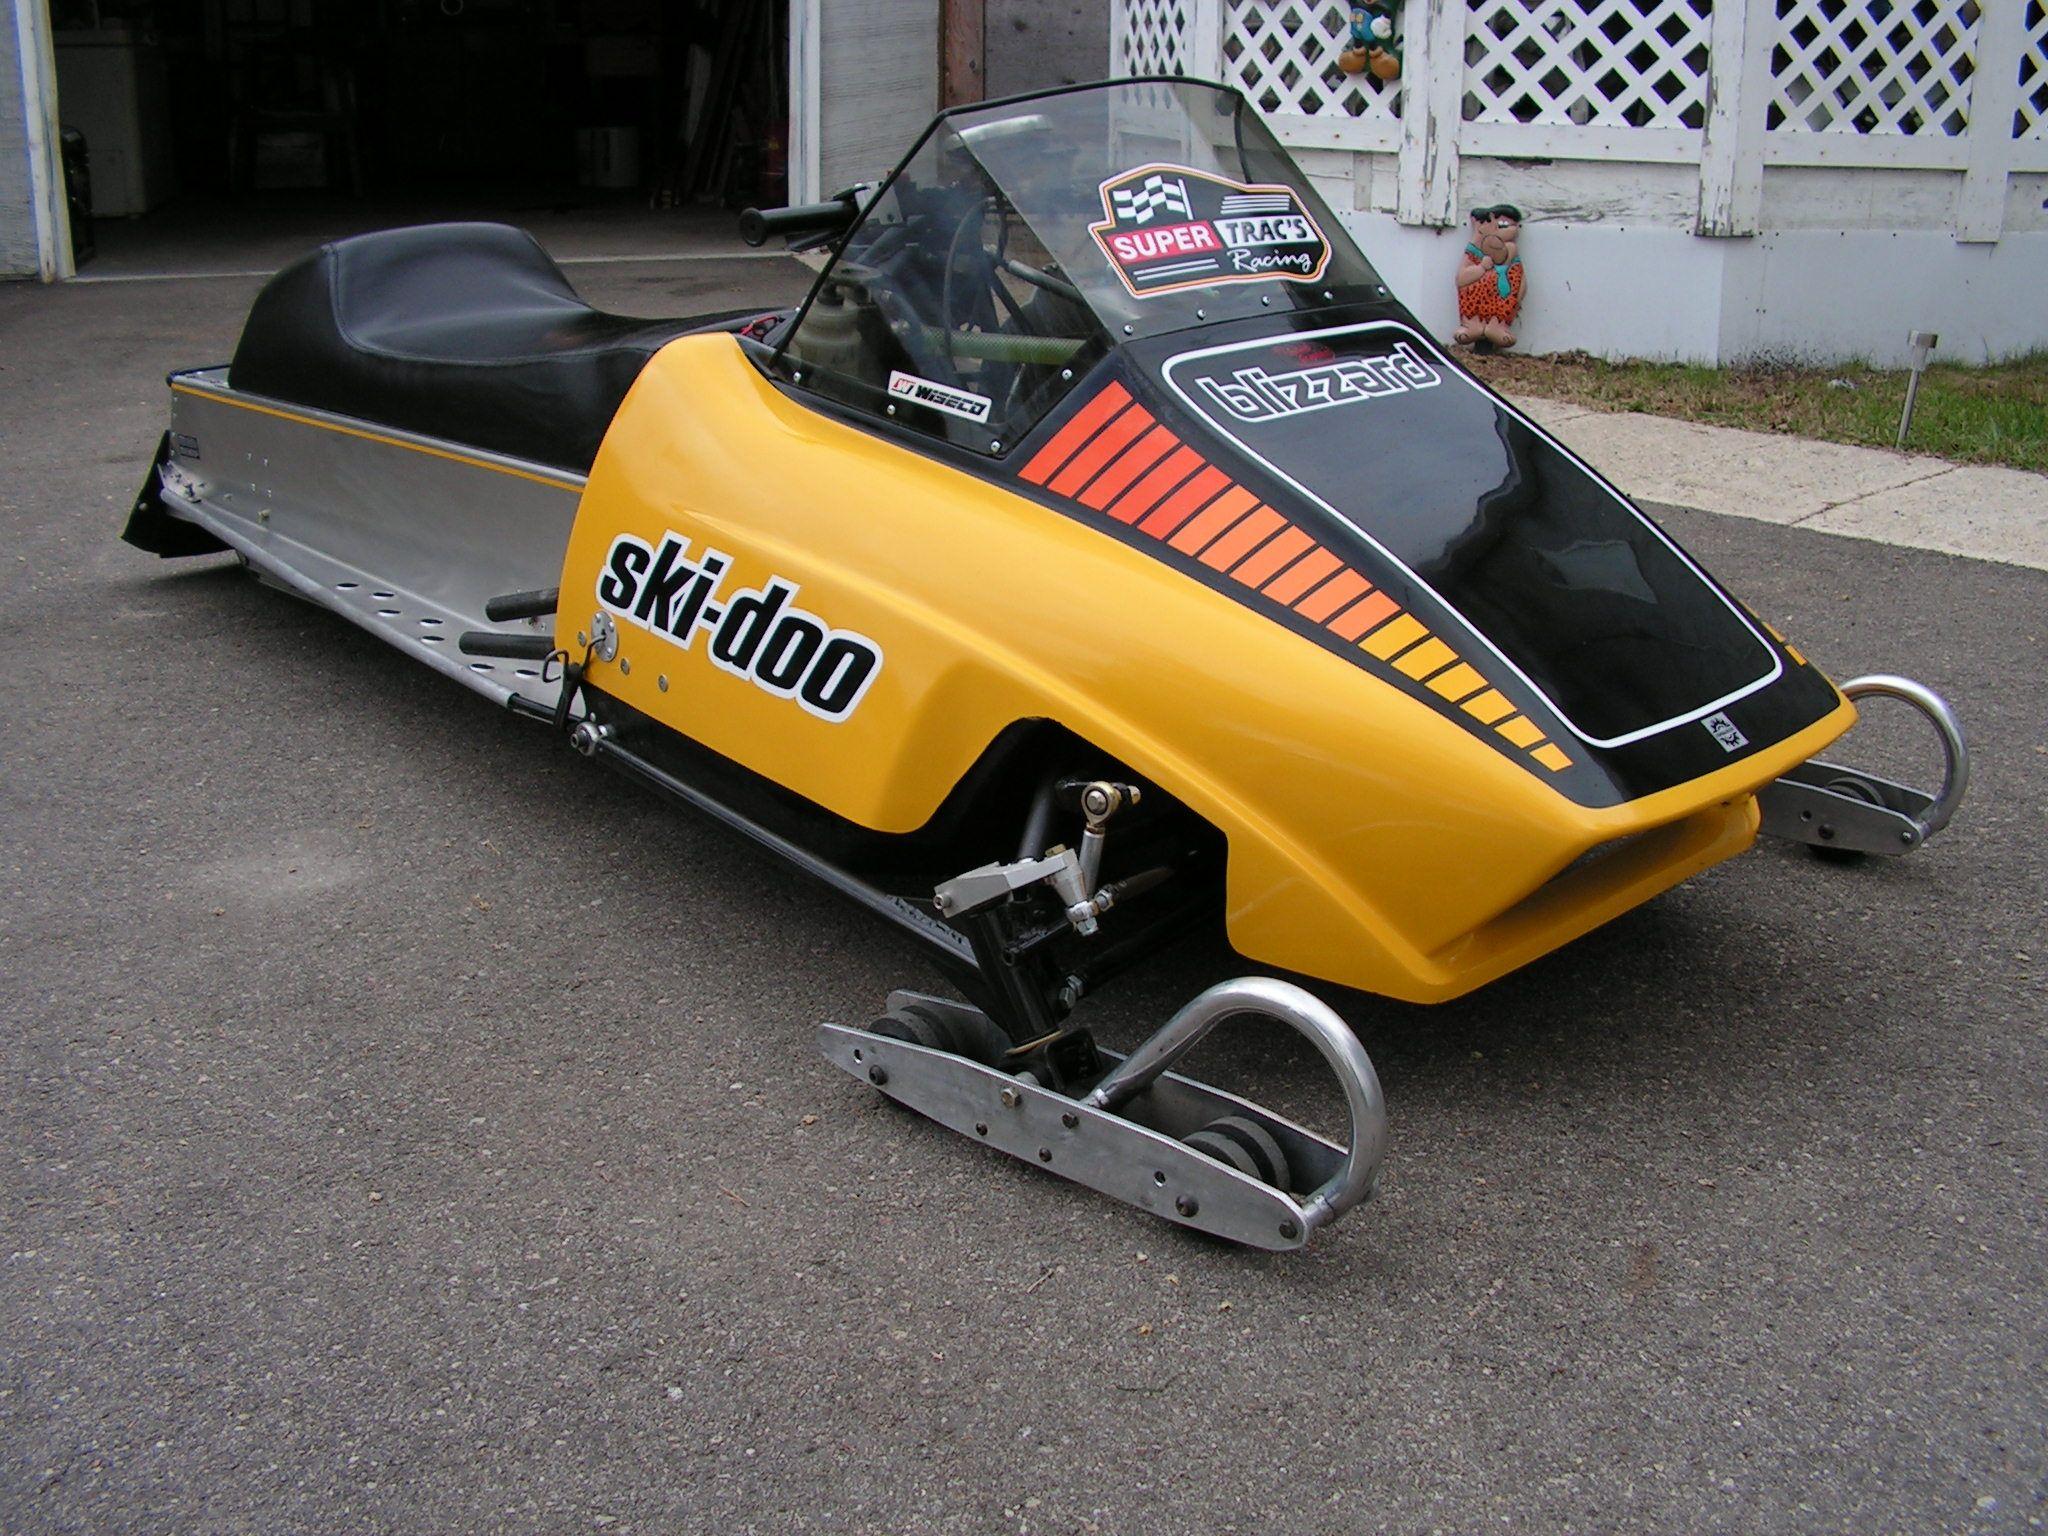 1978 Ski-doo SS clone chassis with 500cc SnoPro engine setup